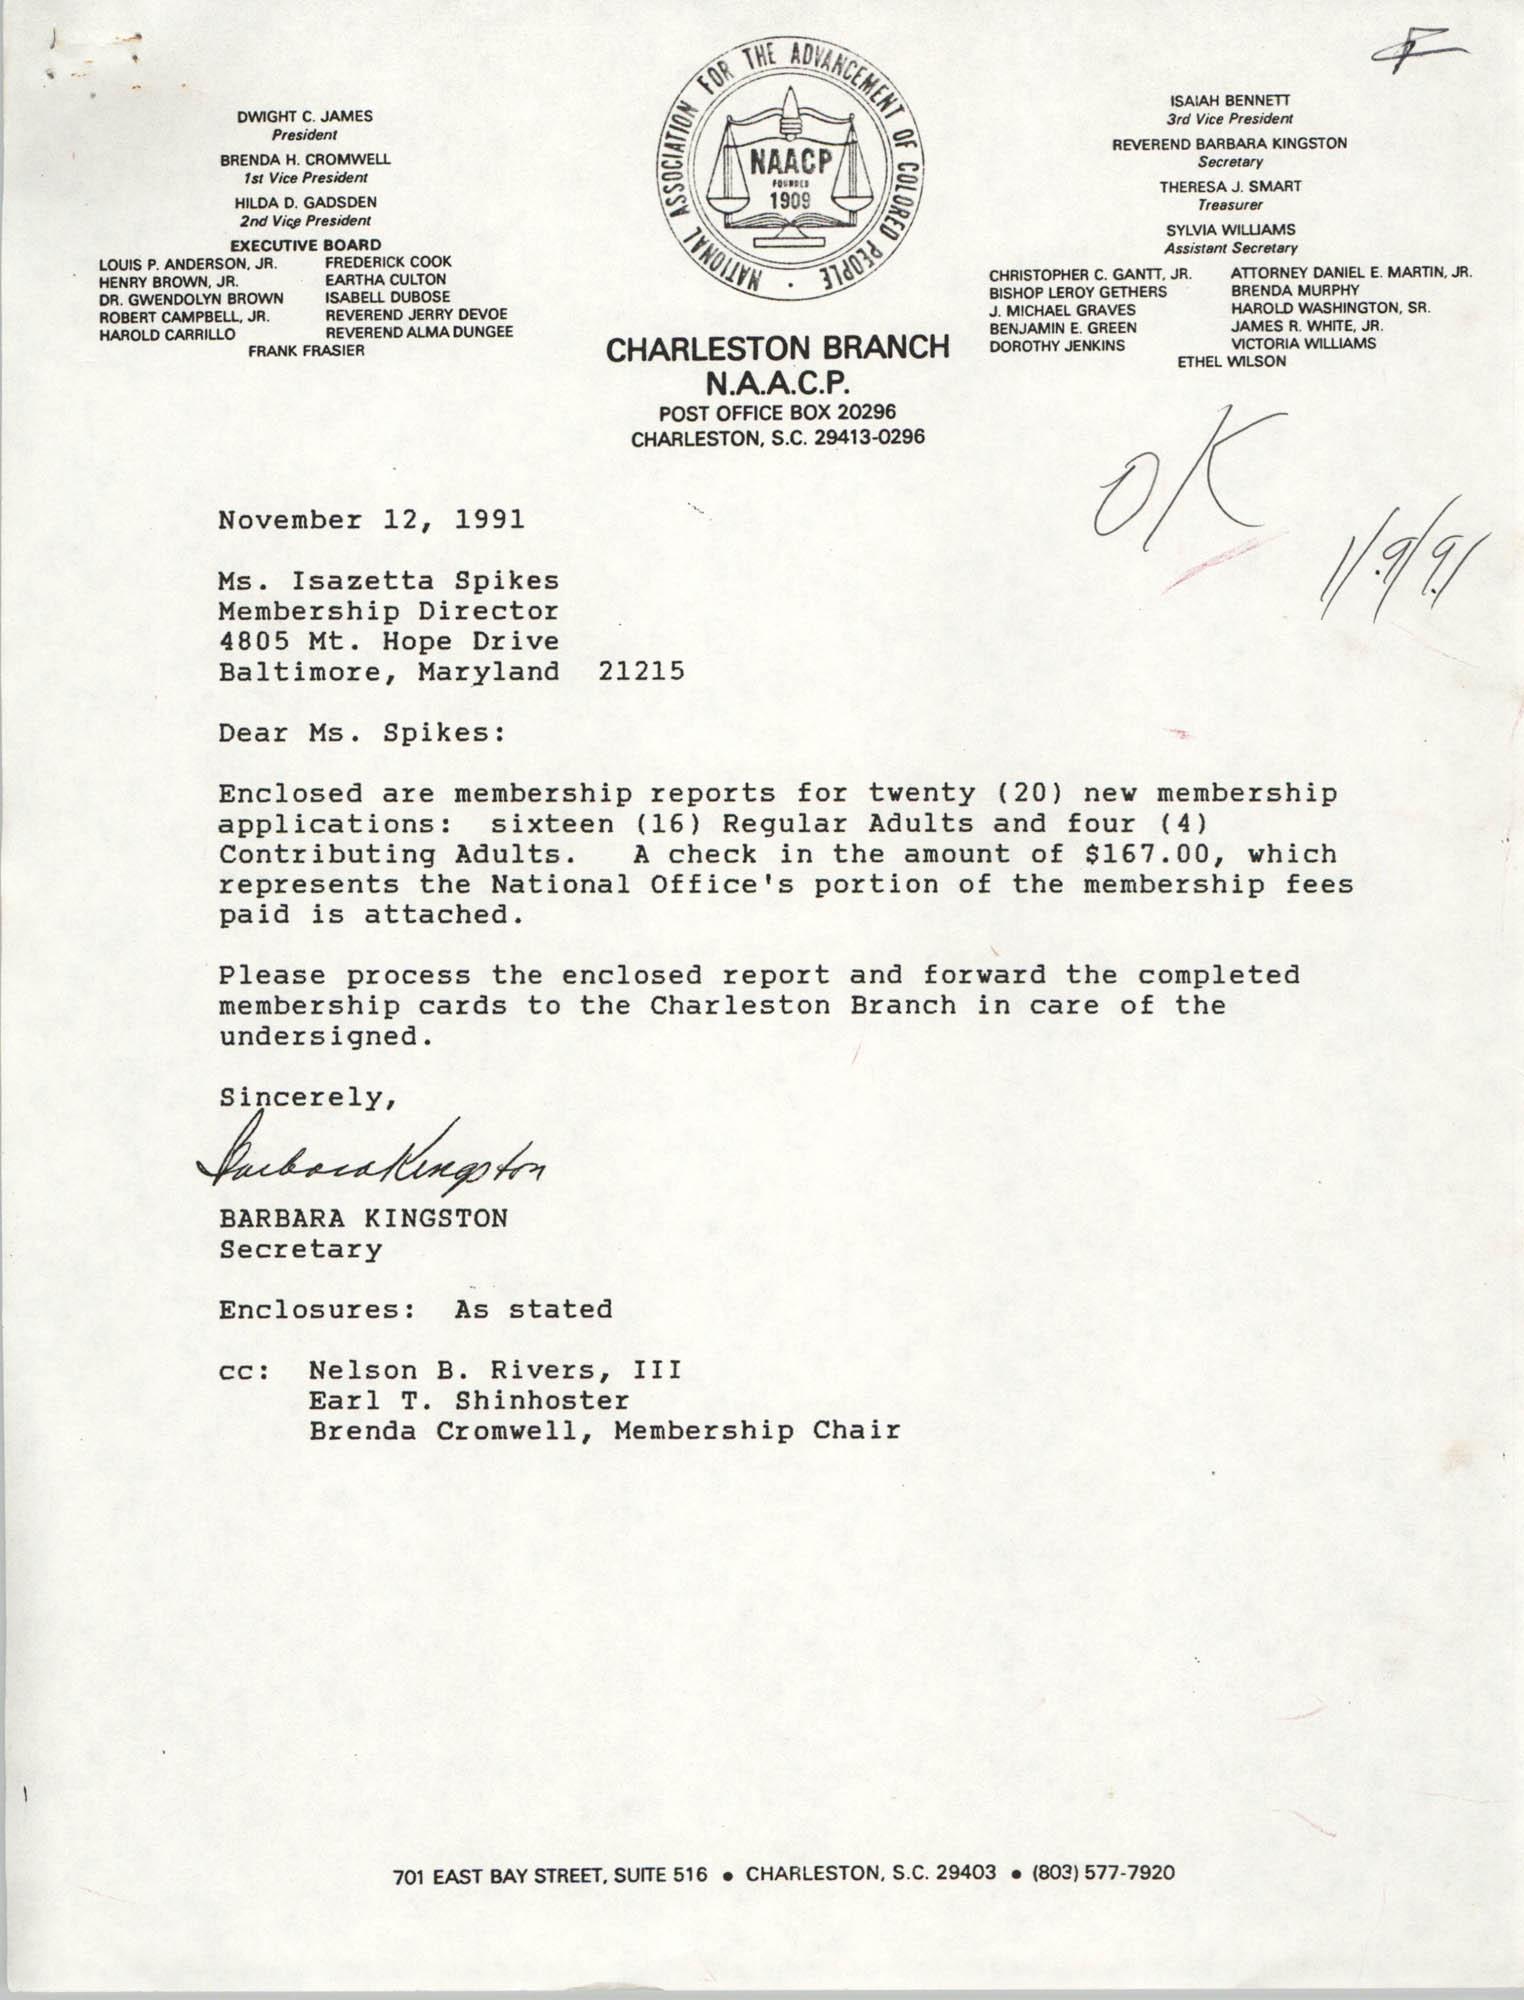 Letter from Barbara Kingston to Isazetta Spikes, November 12, 1991